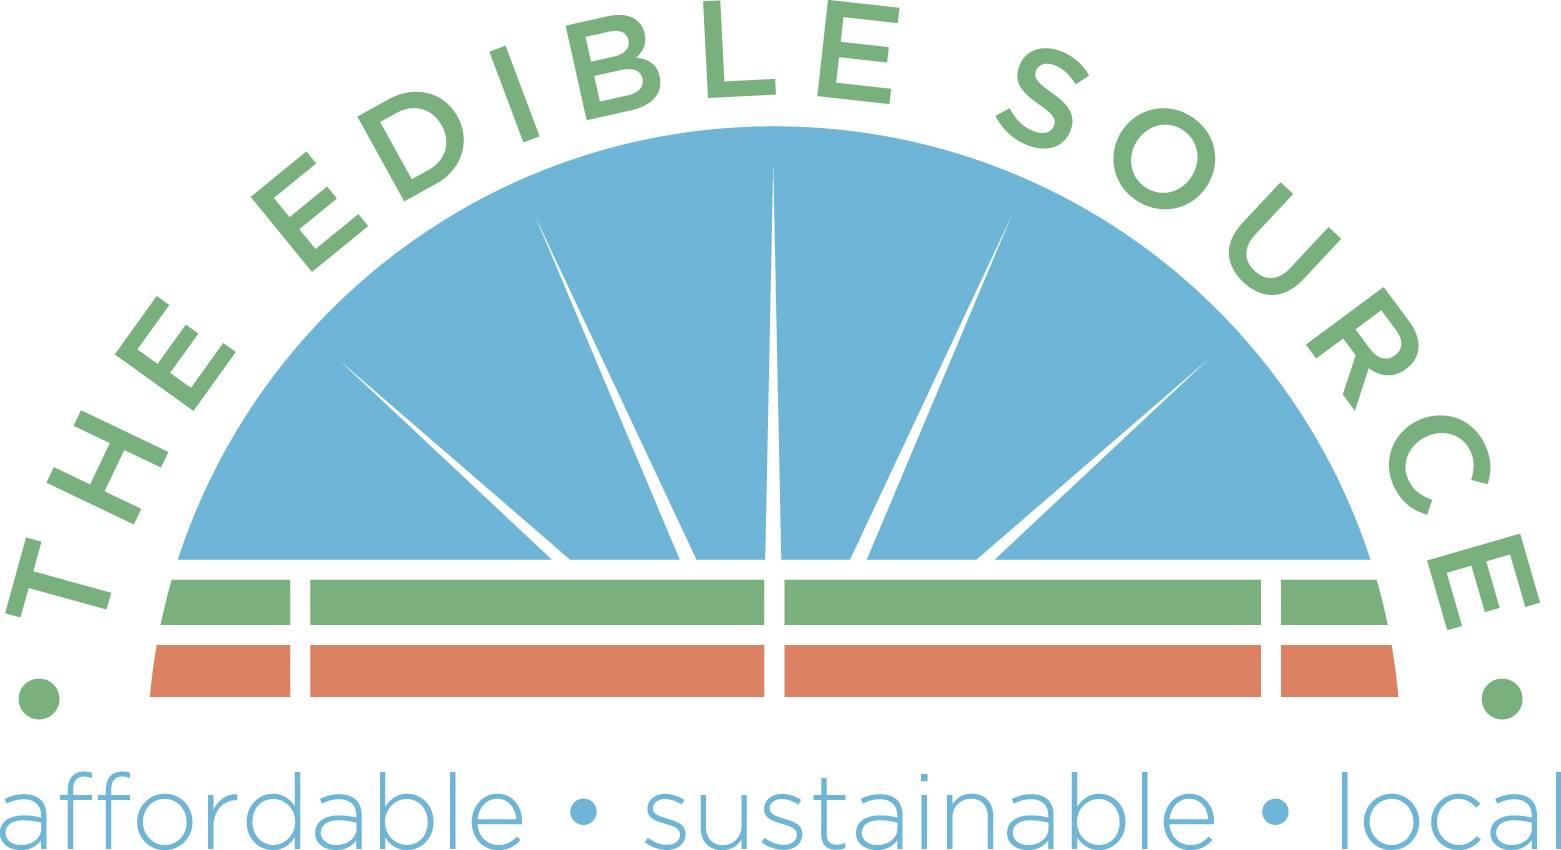 The Edible Source